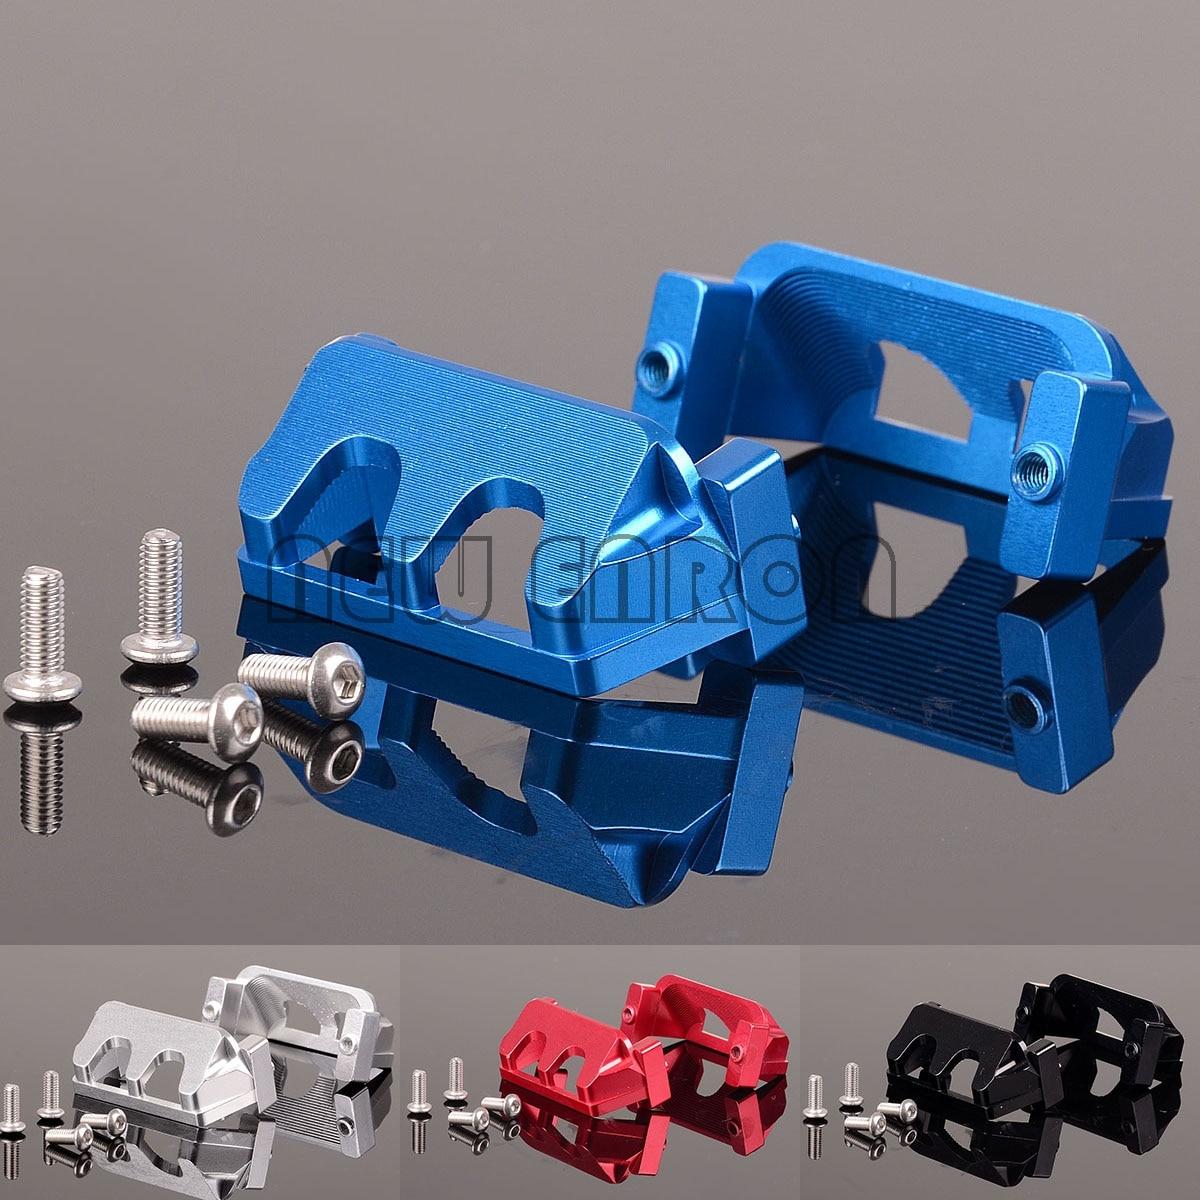 ENRON 2 шт., алюминиевый сервопривод для руля Traxxas 7037 E-Revo VXL Slash 4WD Summit VXL Rc